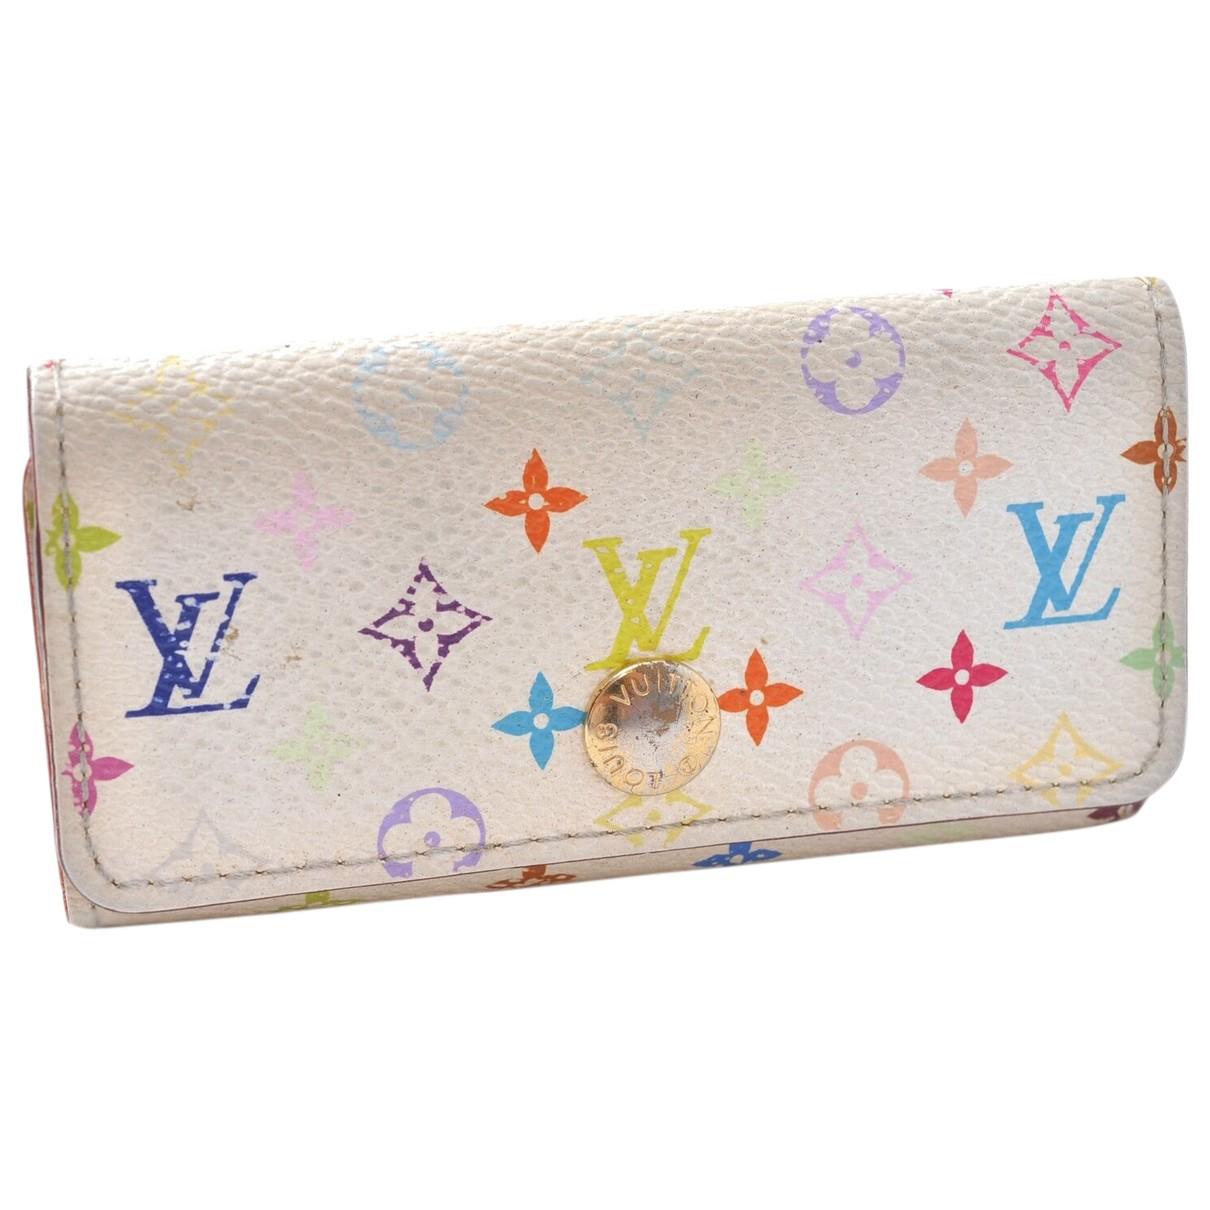 Louis Vuitton - Sac a main   pour femme en toile - blanc